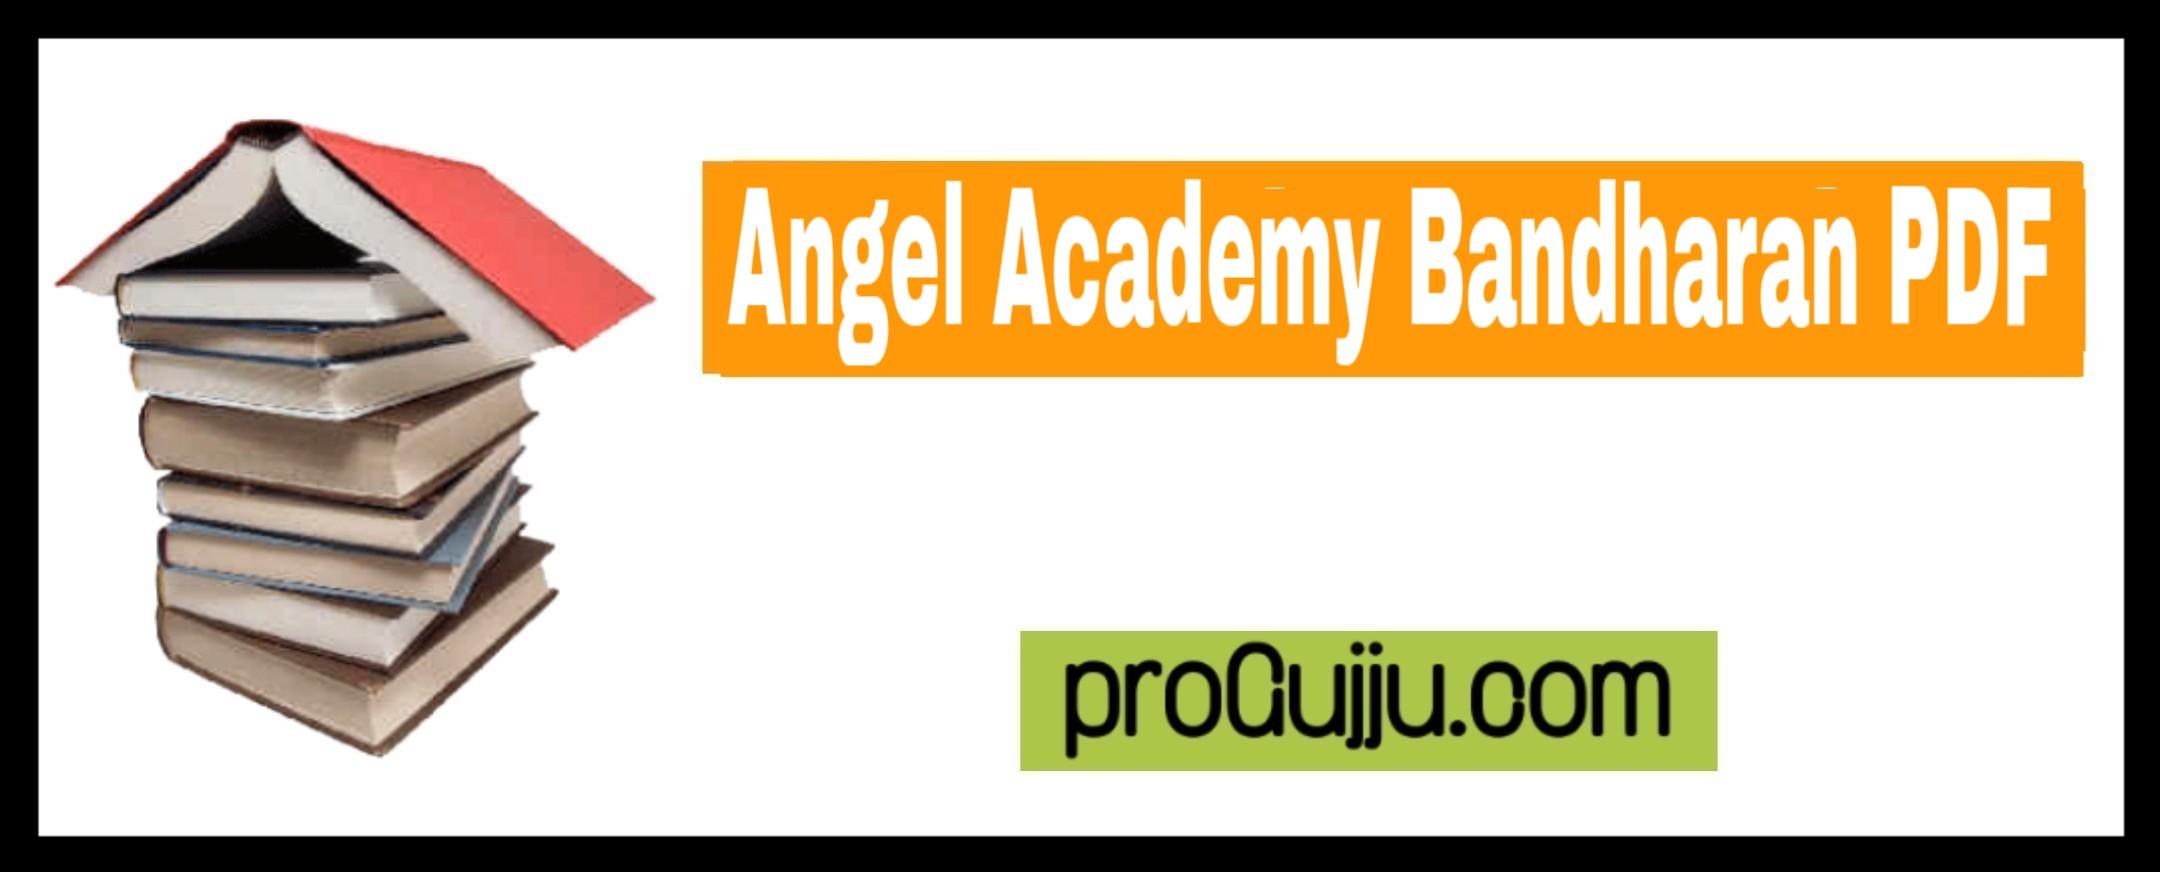 Angel Academy Bandharan PDF